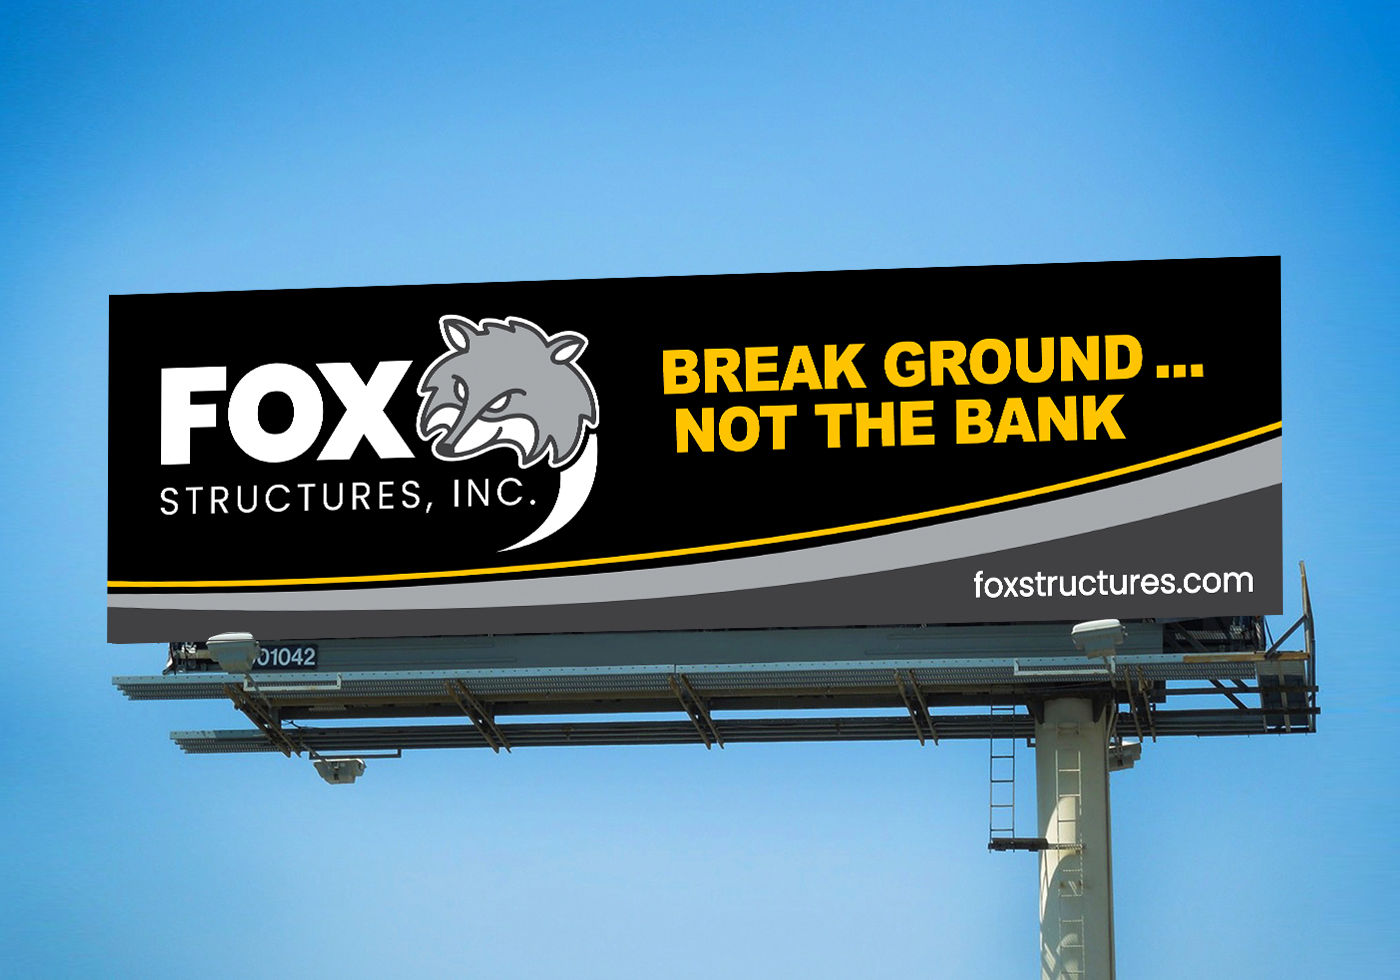 Fox Structures Billboard design by Insight Creative